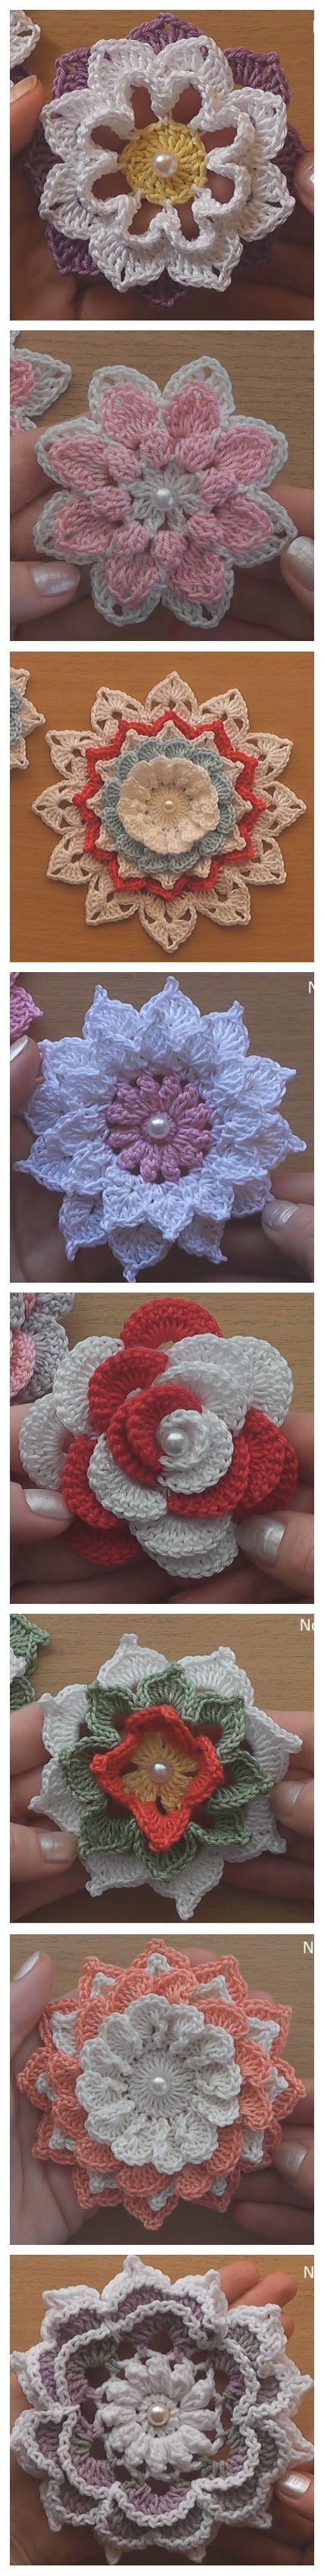 Crochet 8 Gorgeous Flowers